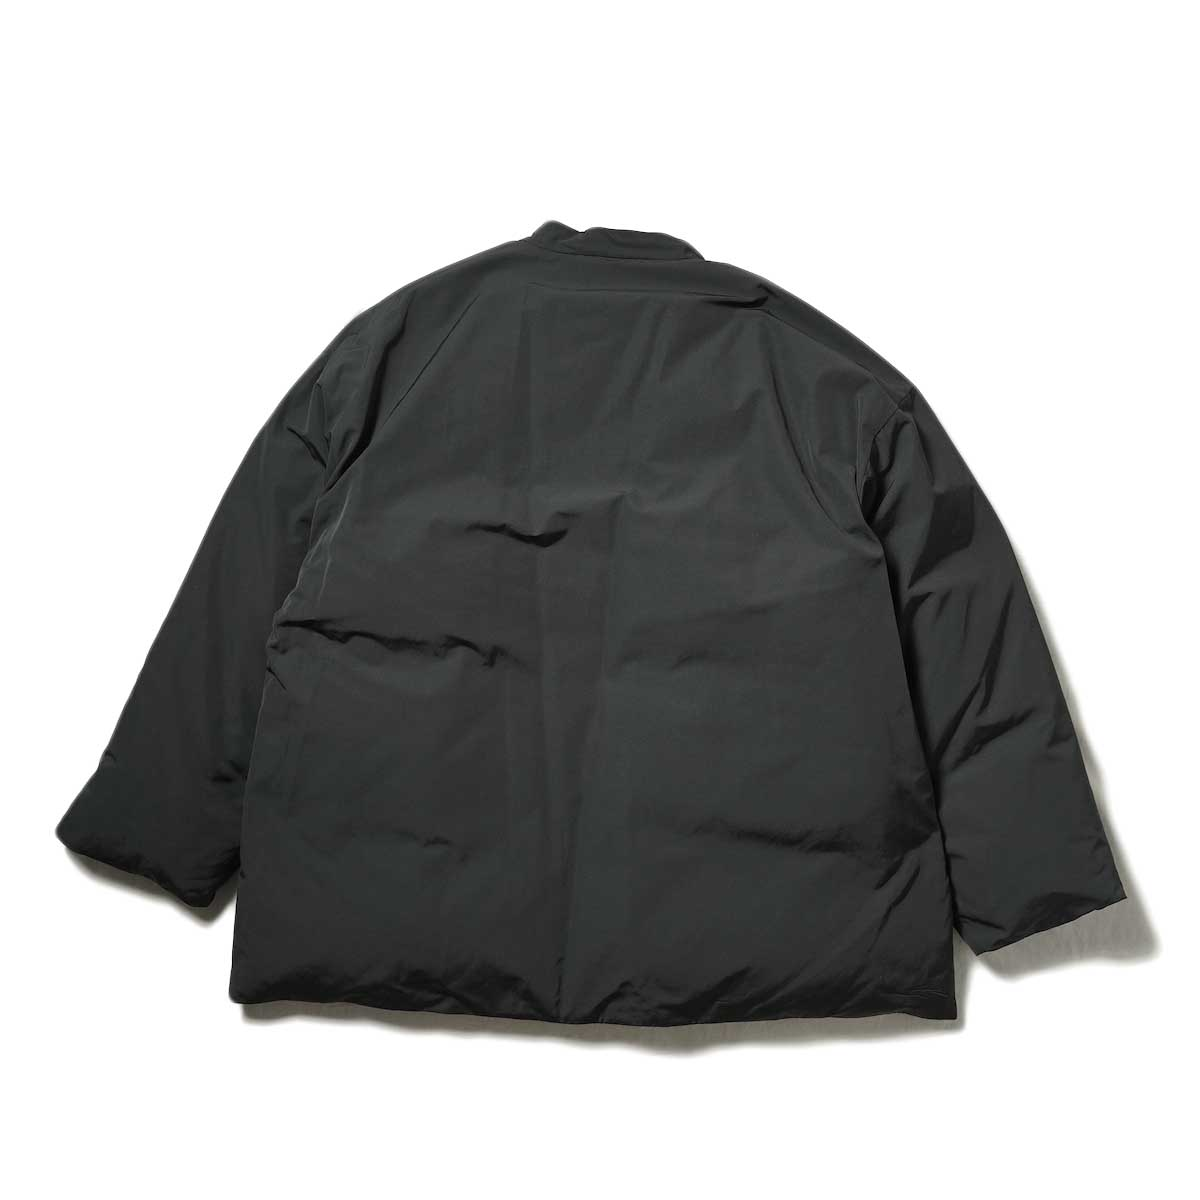 blurhms / Stand-up Collar Down Jacket (Black) 背面